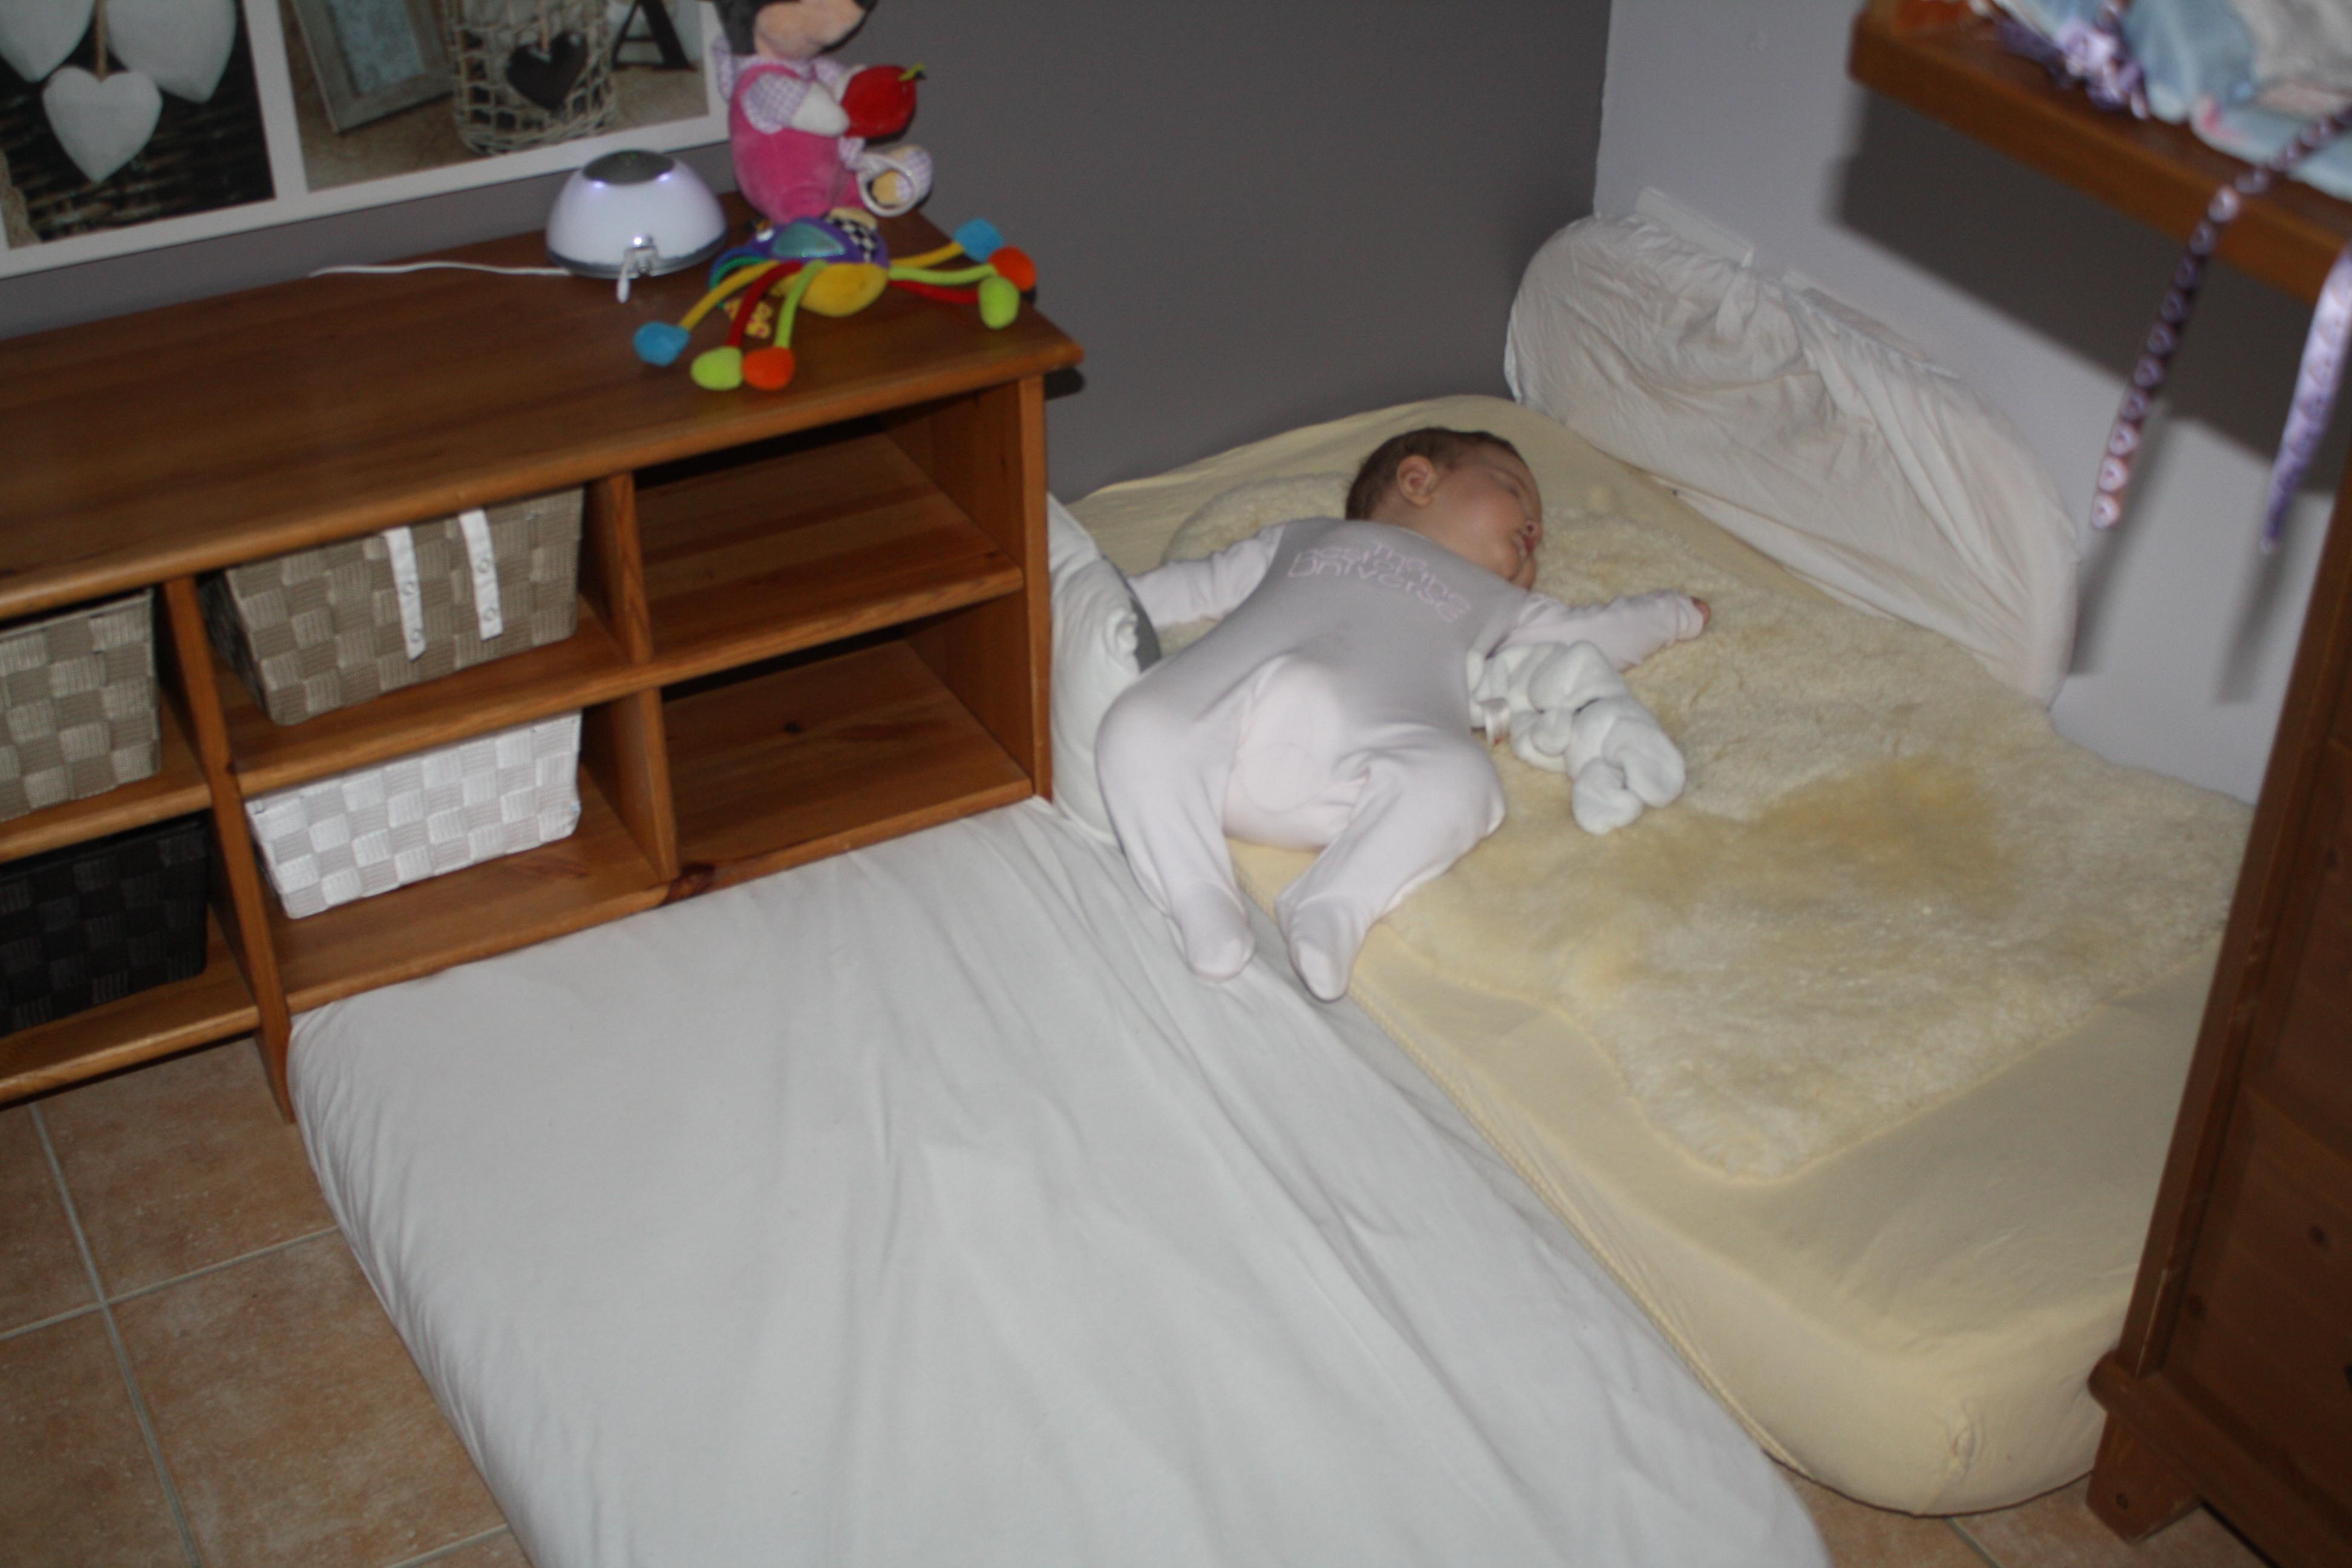 dormir sur un matelas au sol matelas sol futon lit double prix dormir matelas au sol dormir. Black Bedroom Furniture Sets. Home Design Ideas